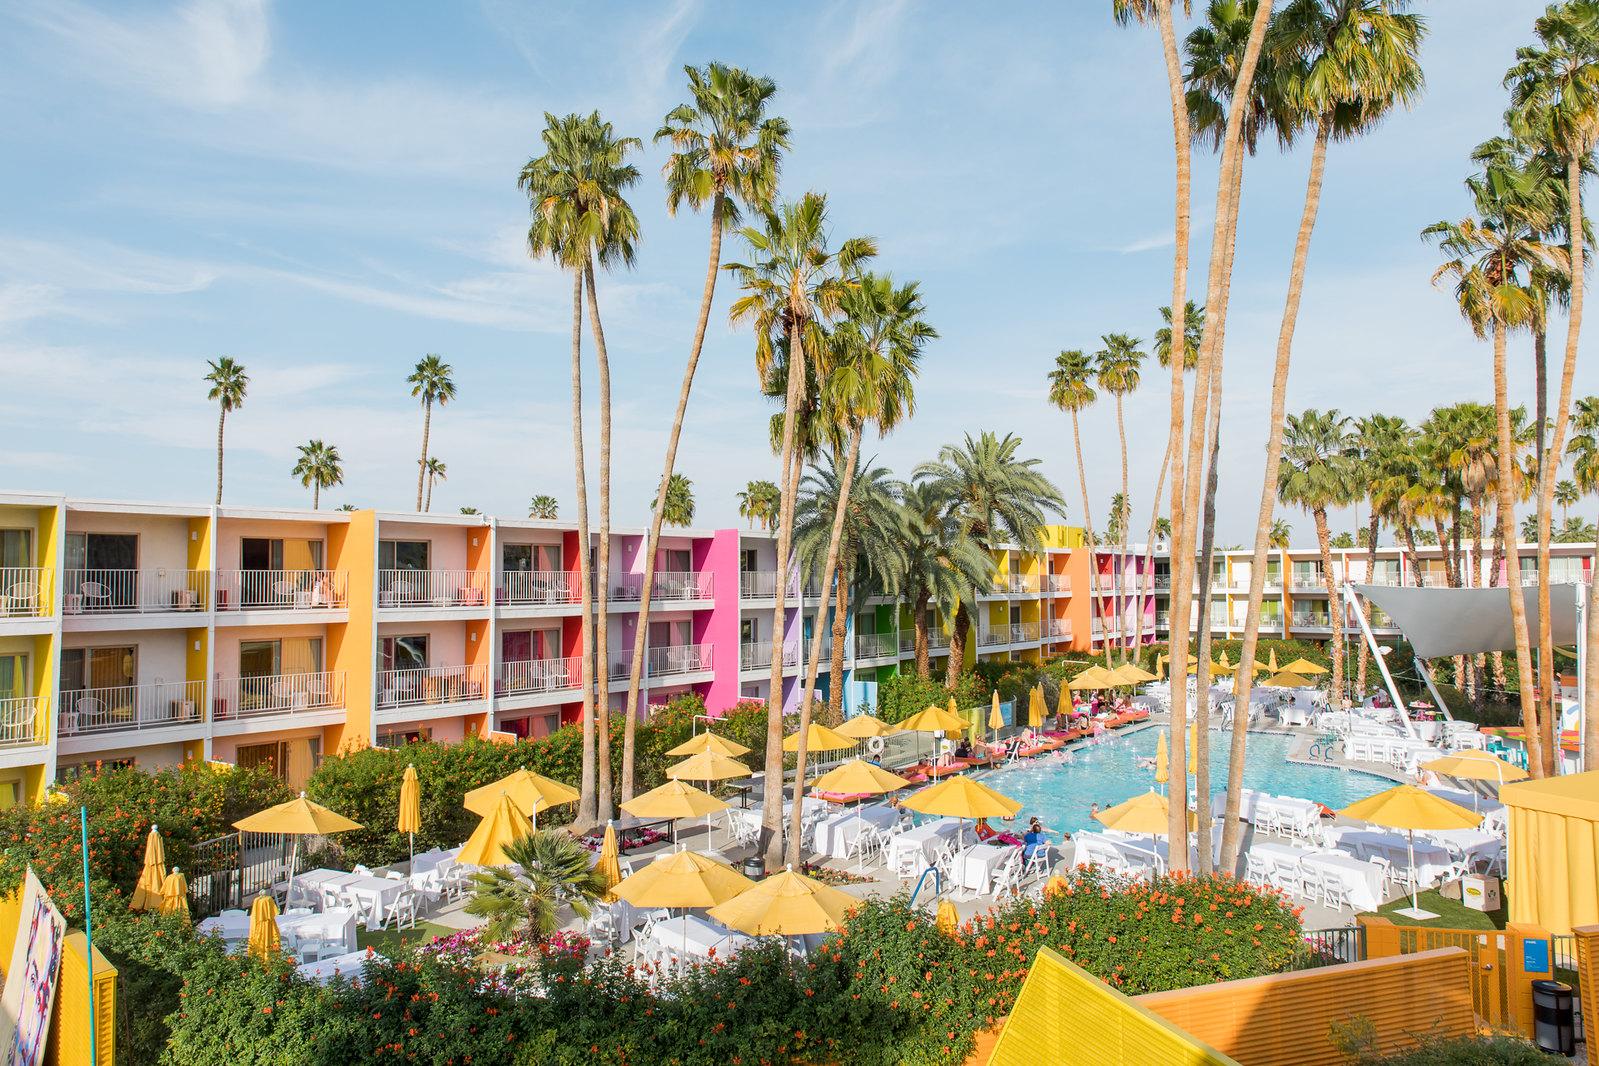 Saguaro Hotel Palm Springs,  Photo by Kristen Tucker